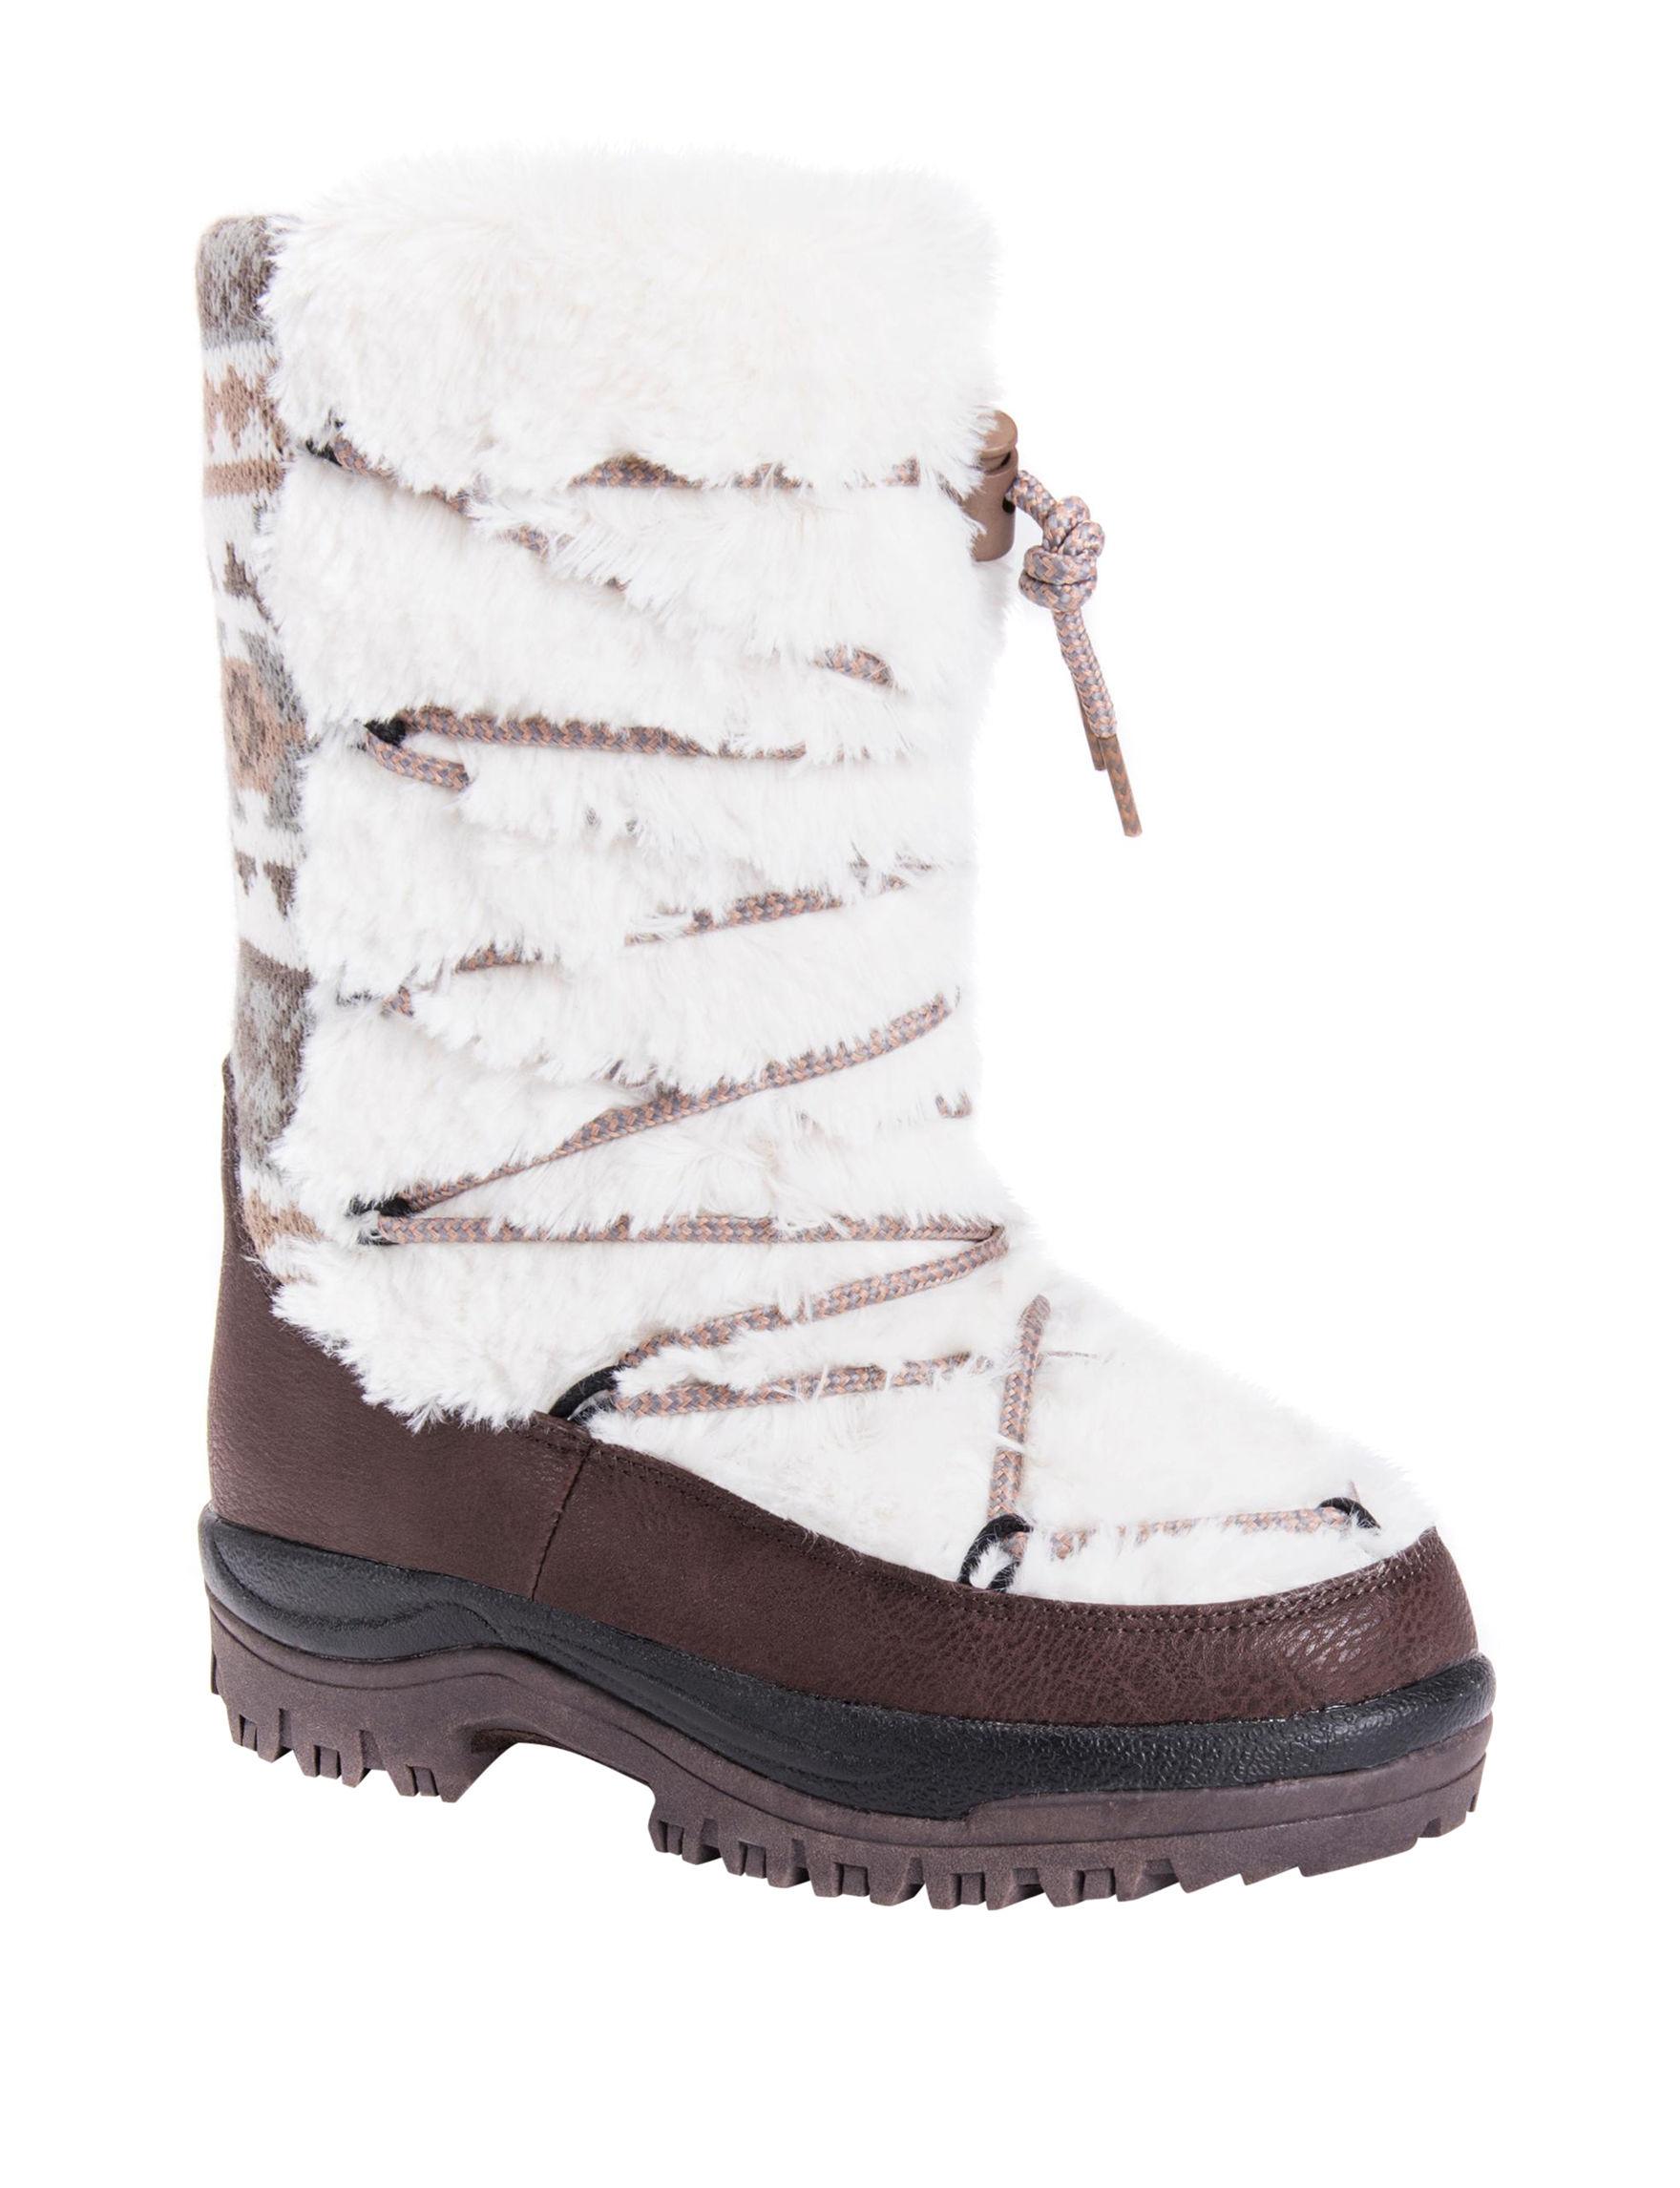 Muk Luks Ivory Winter Boots